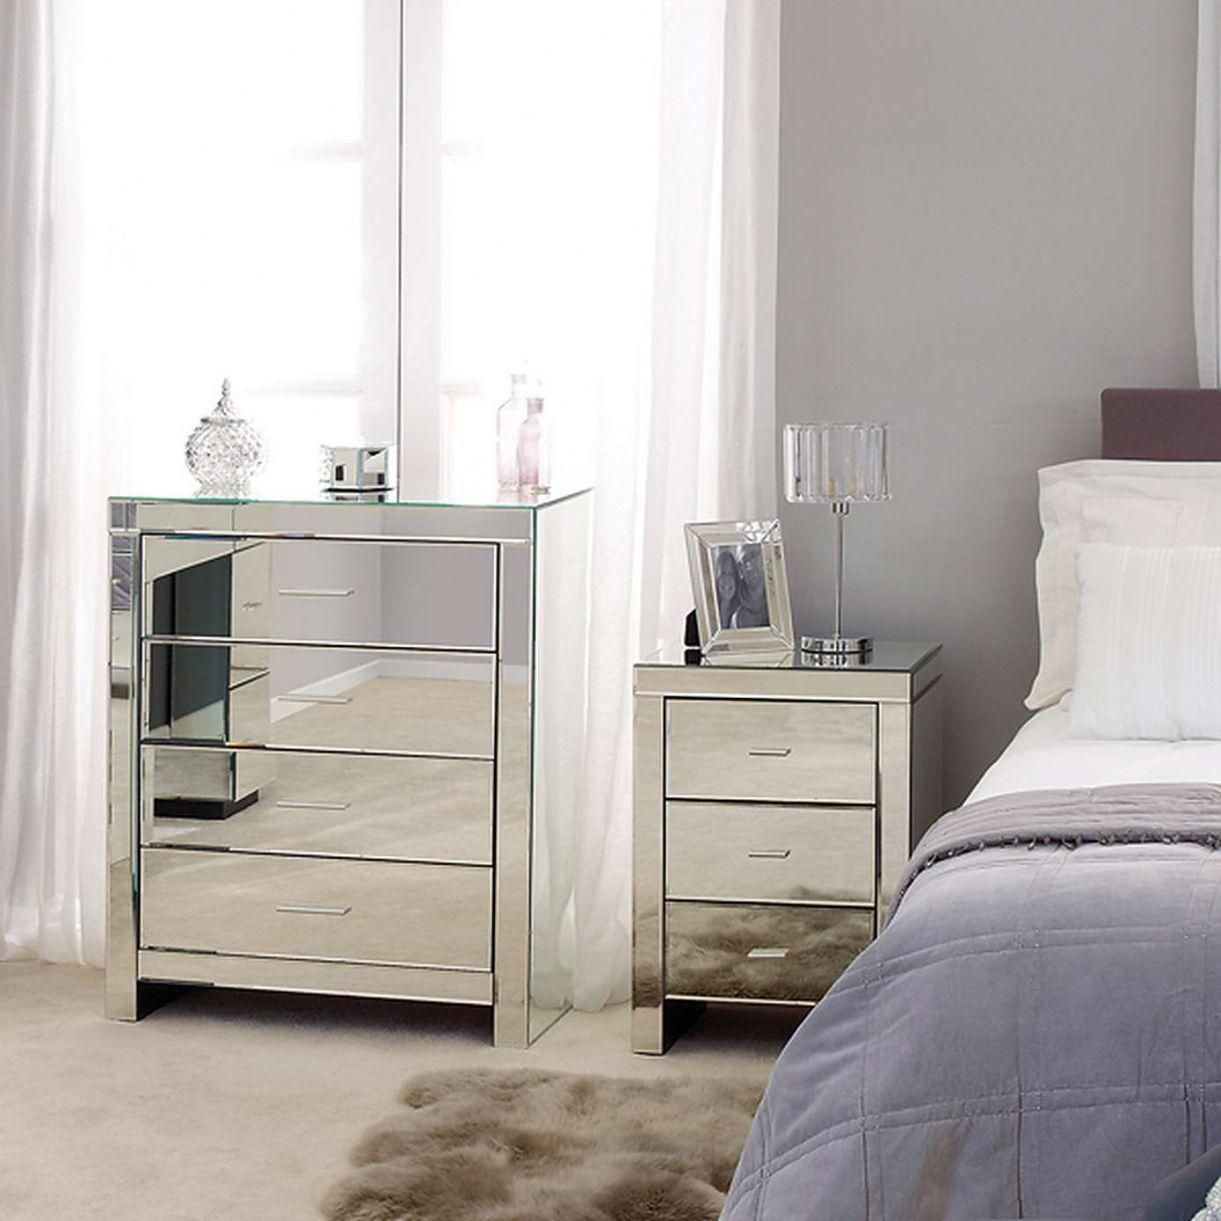 Cheap mirrored bedroom furniture sets interior design bedroom